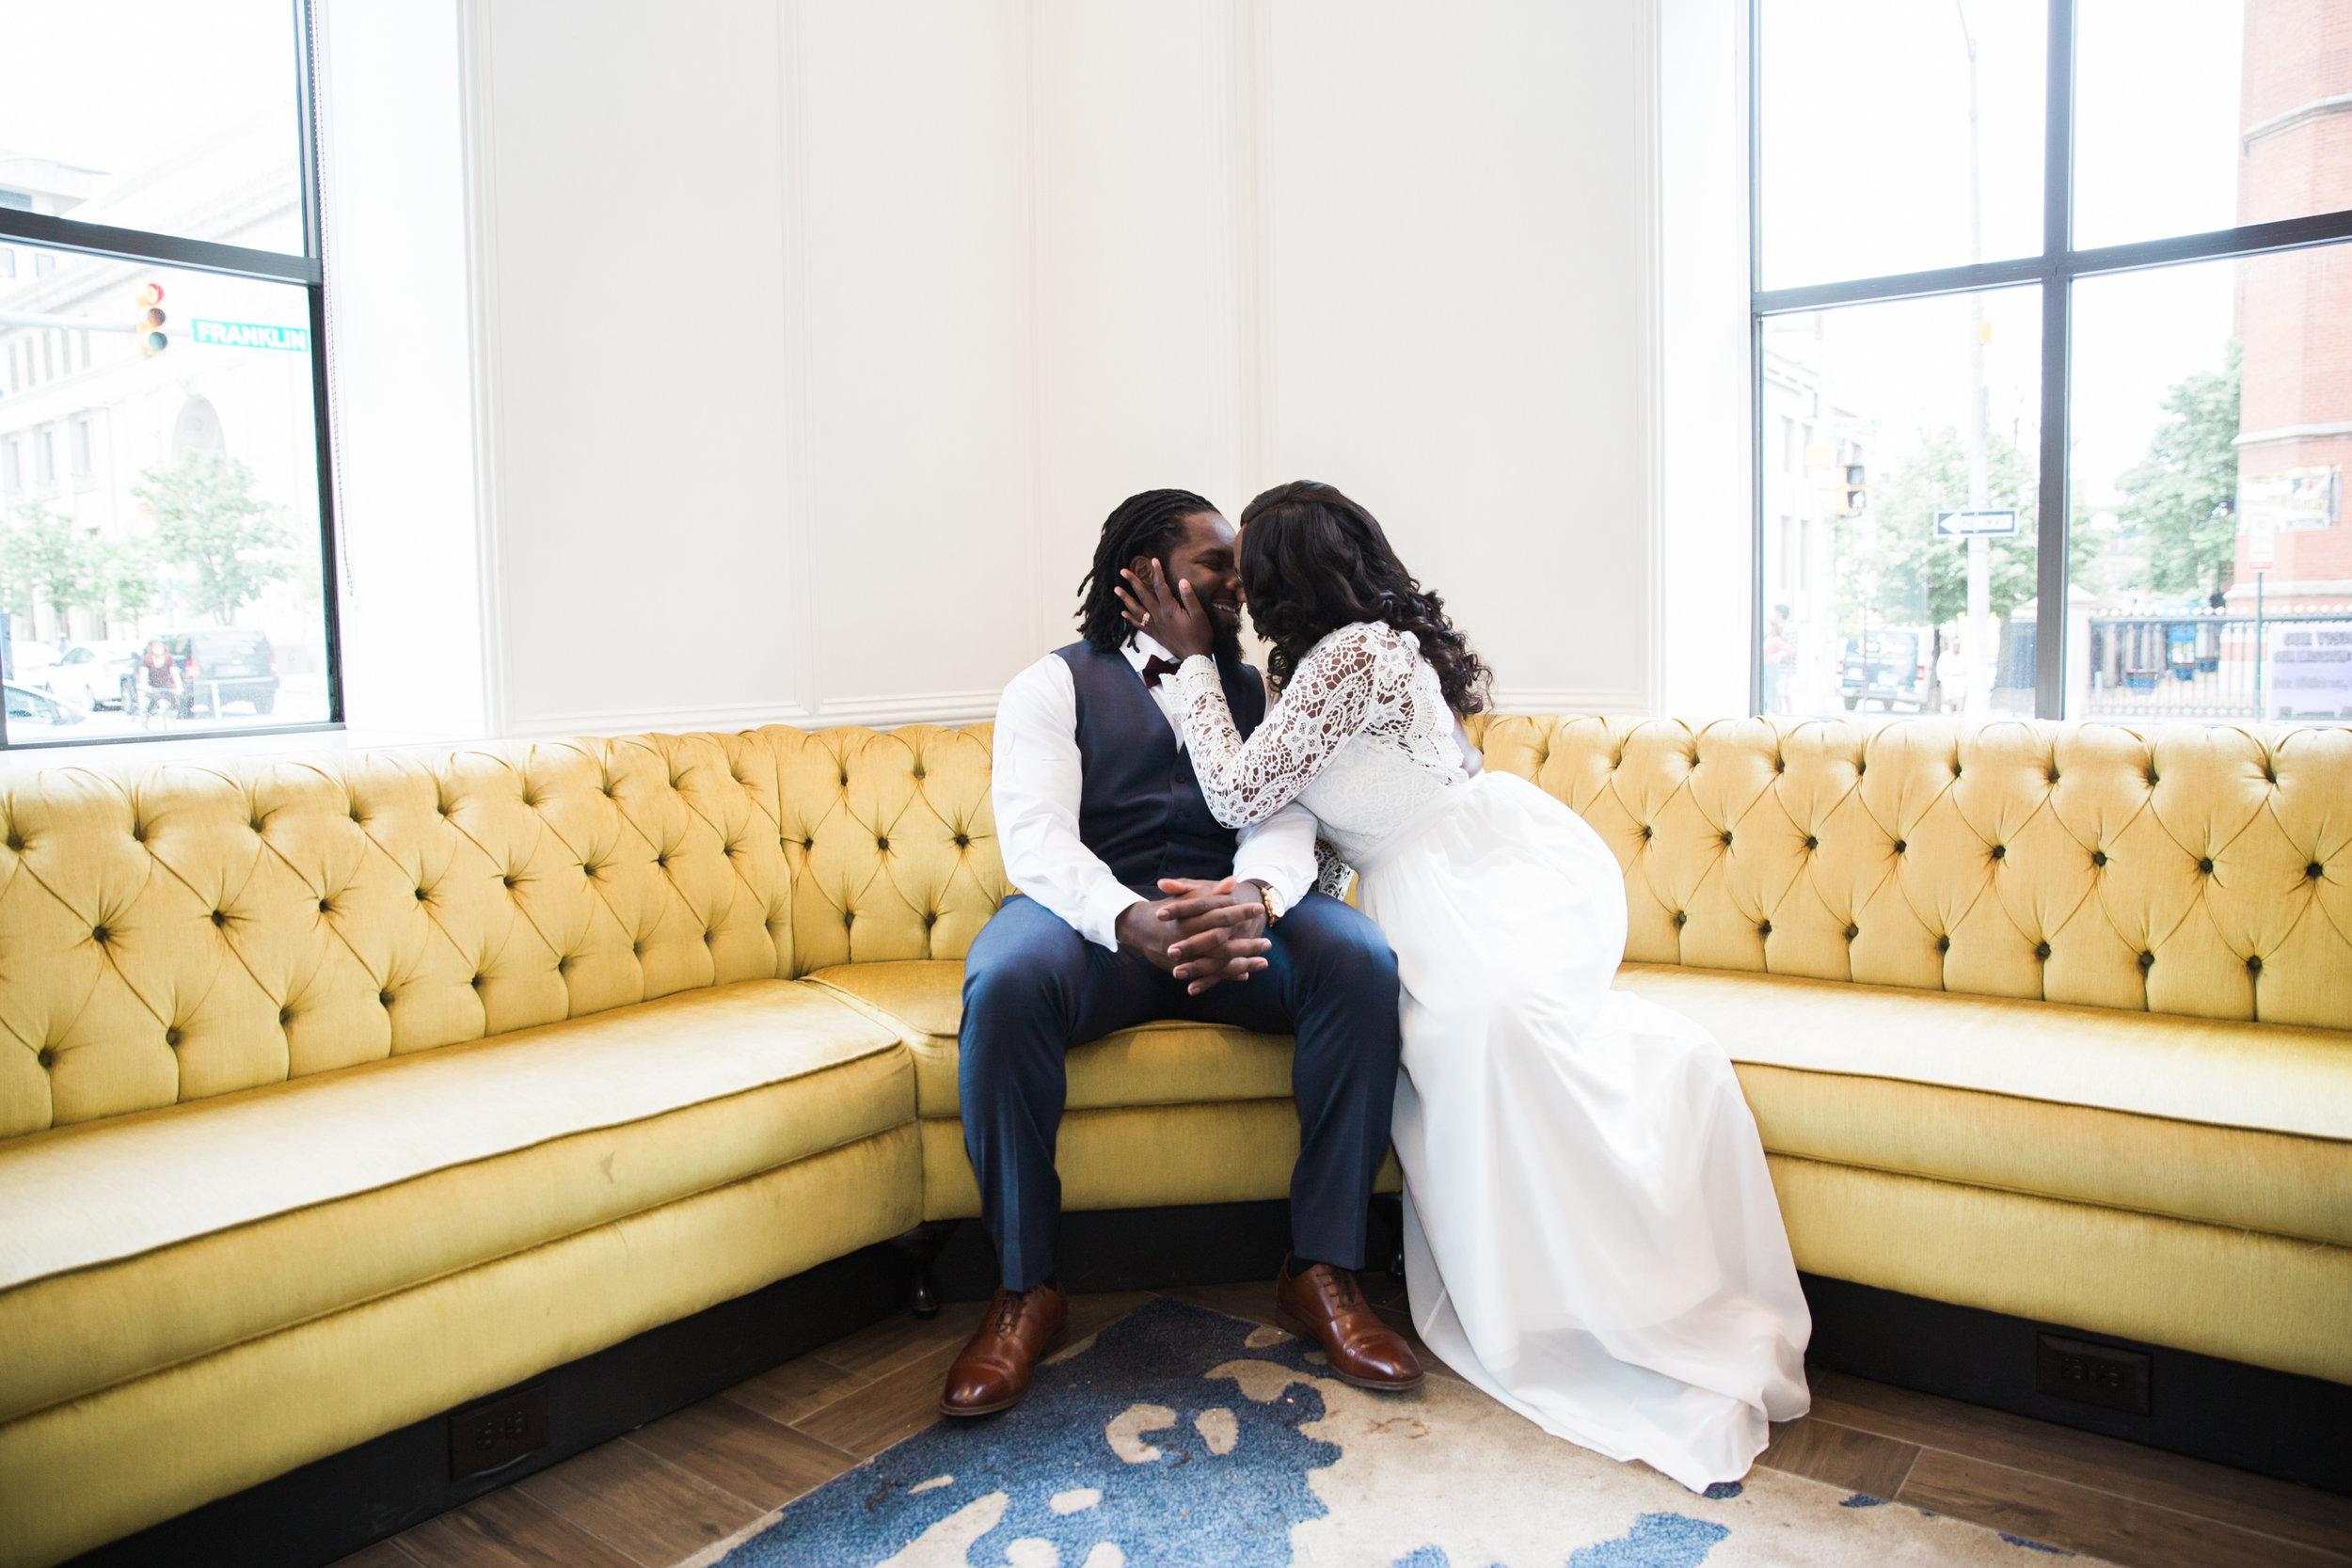 Baltimore City Wedding at Hotel Indigo Megapixels Media Photography Tira Lynn Events Black Bride and Groom (35 of 74).jpg